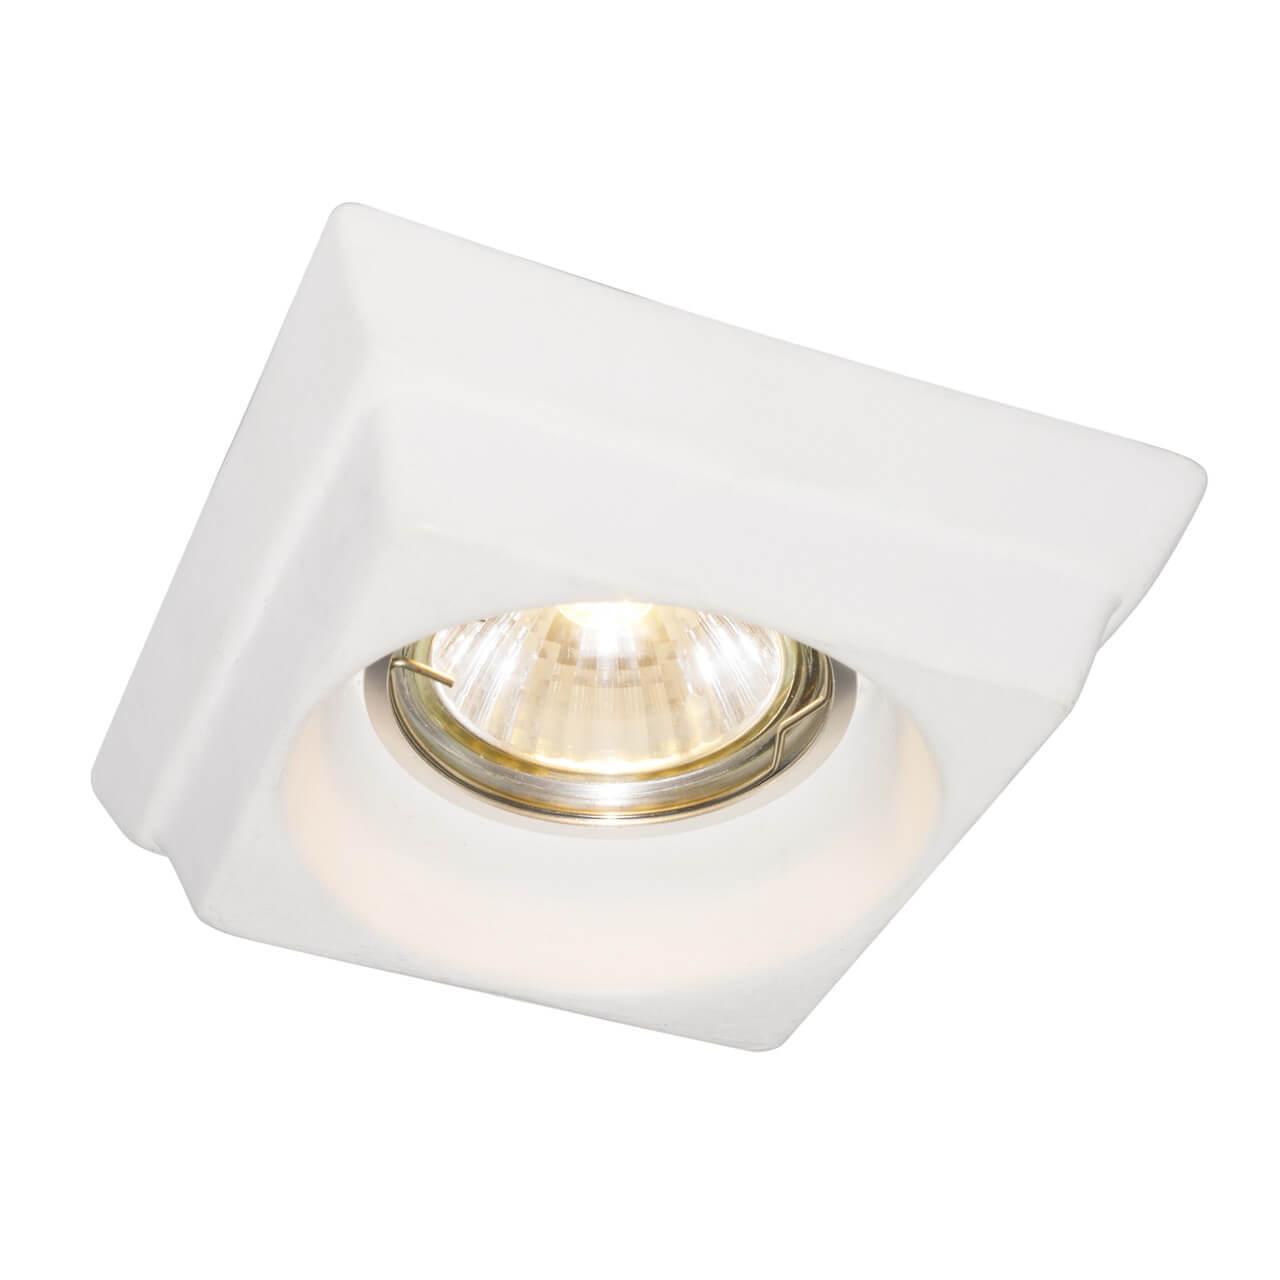 Встраиваемый светильник Arte Lamp Cratere A5247PL-1WH arte lamp светильник точечный arte lamp cratere a5073pl 1wh